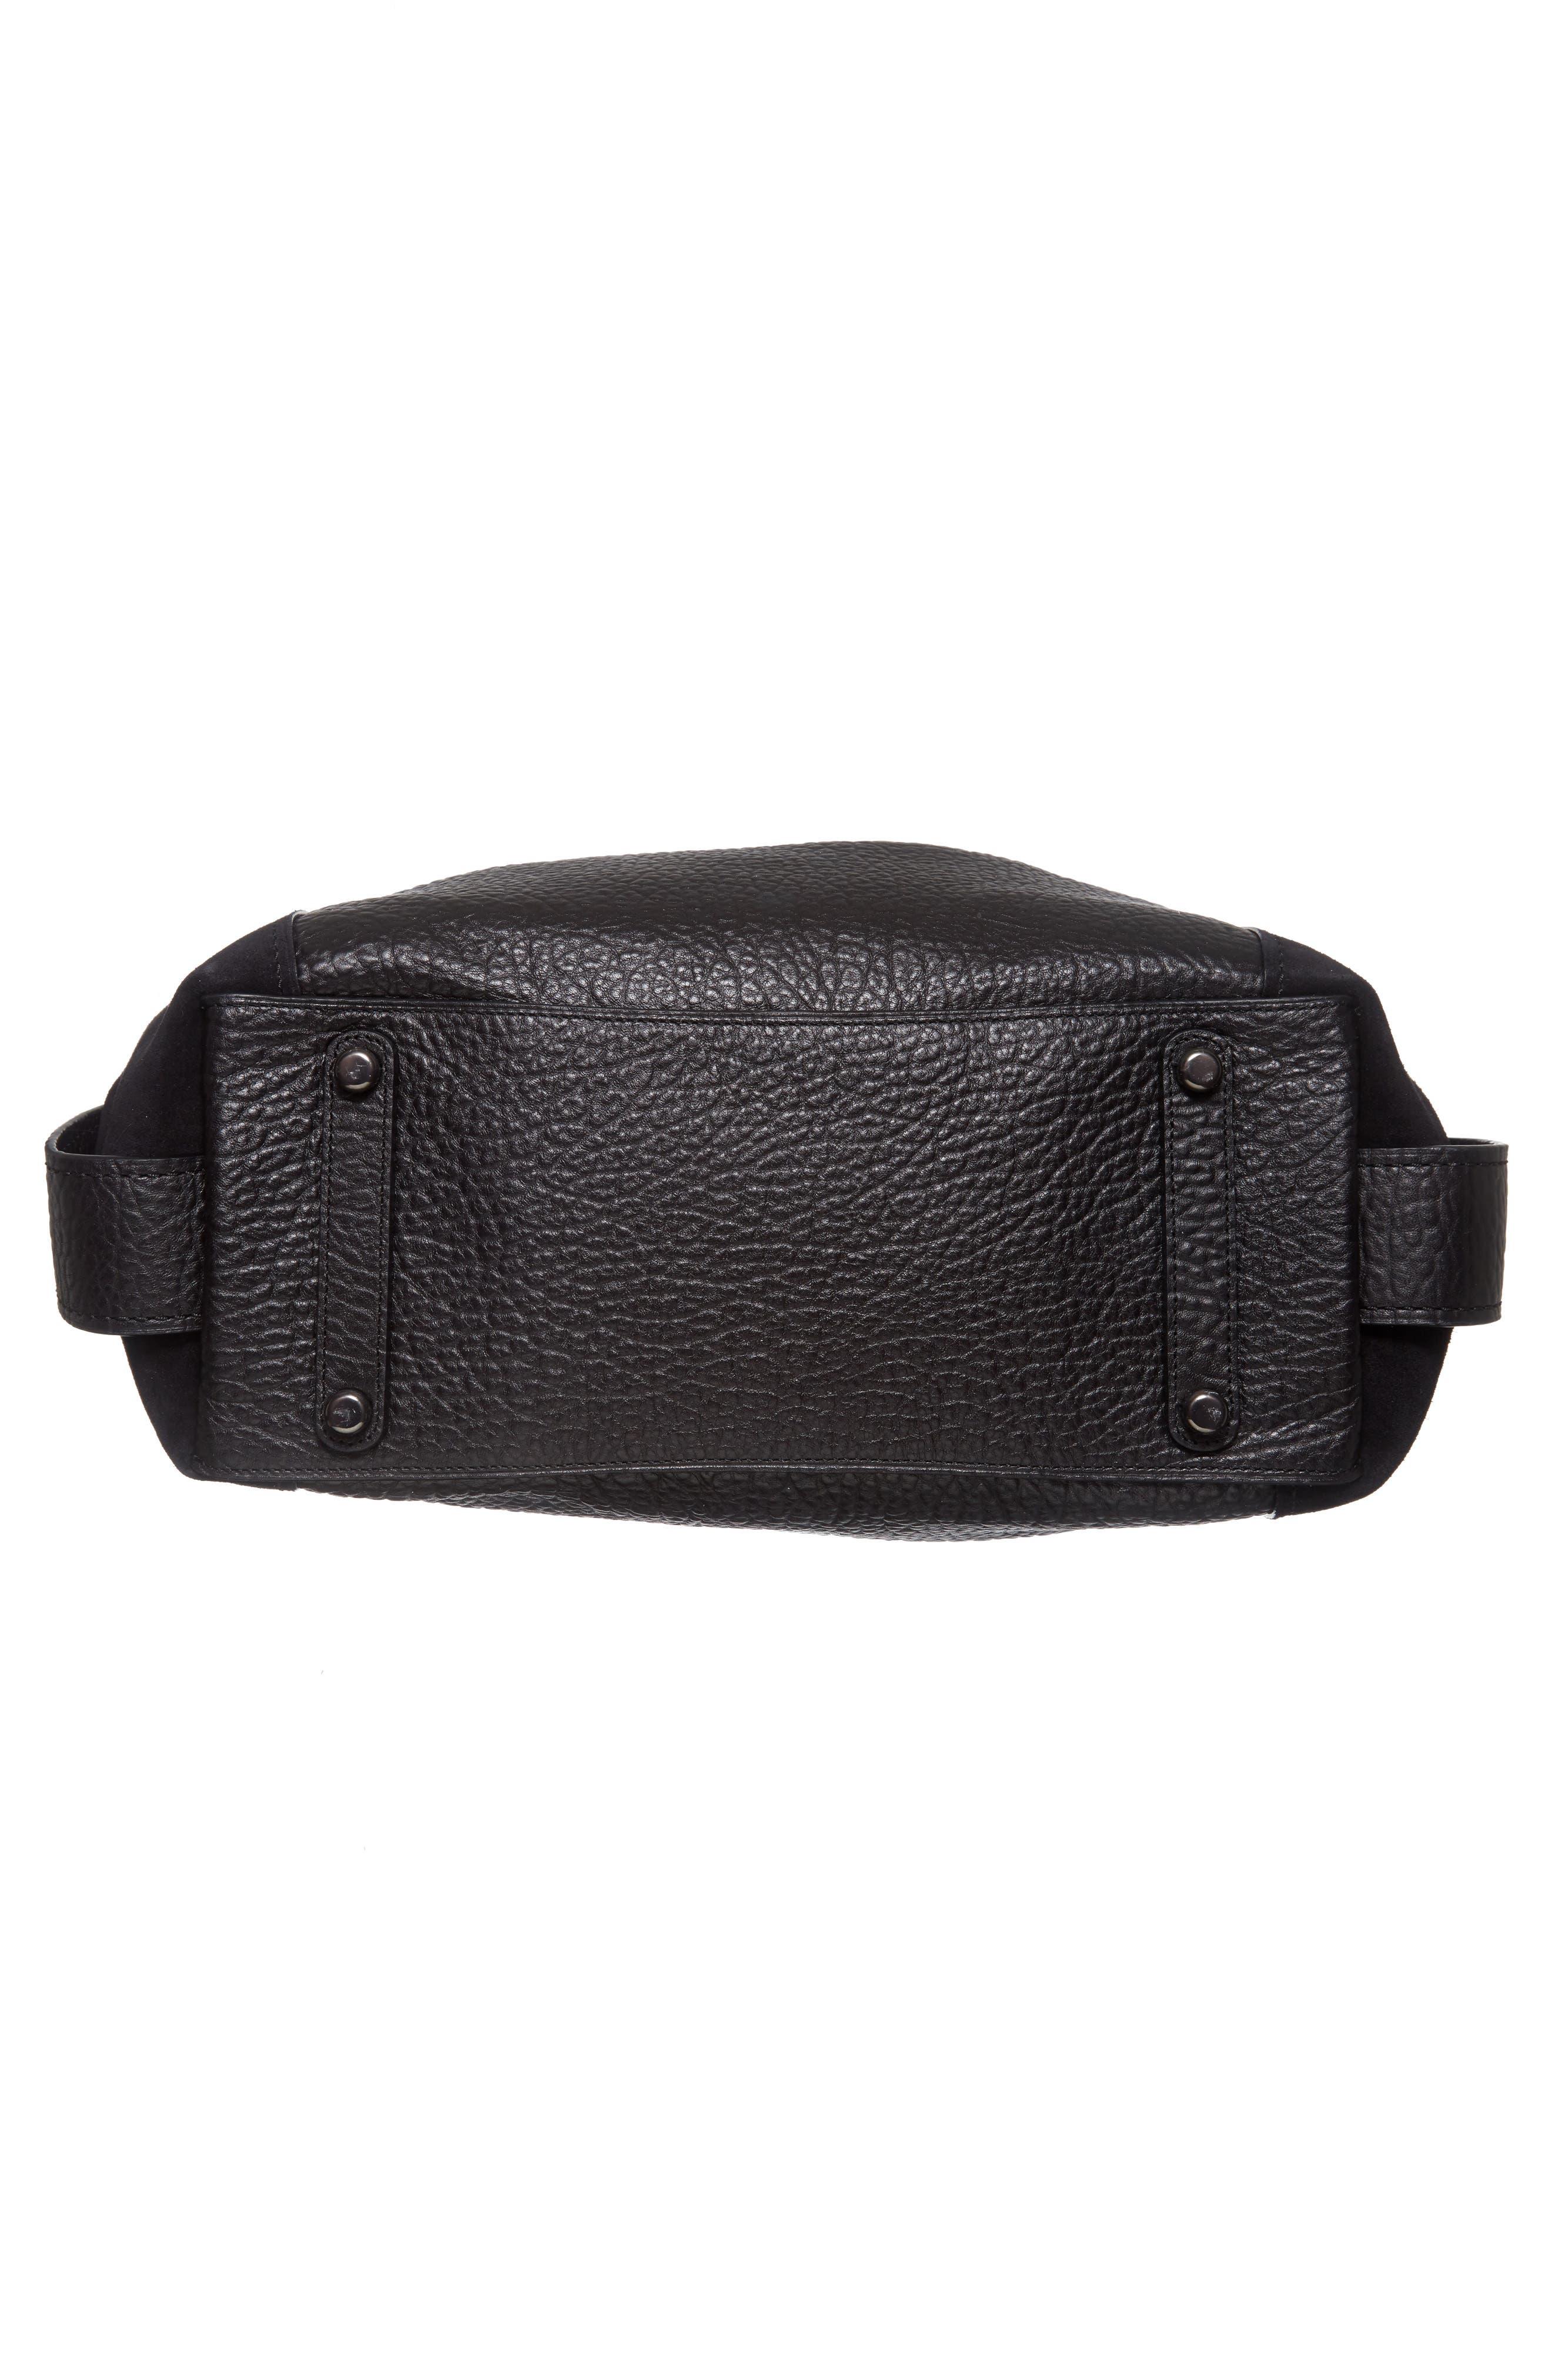 Edie 42 Leather & Suede Shoulder Bag,                             Alternate thumbnail 6, color,                             Black